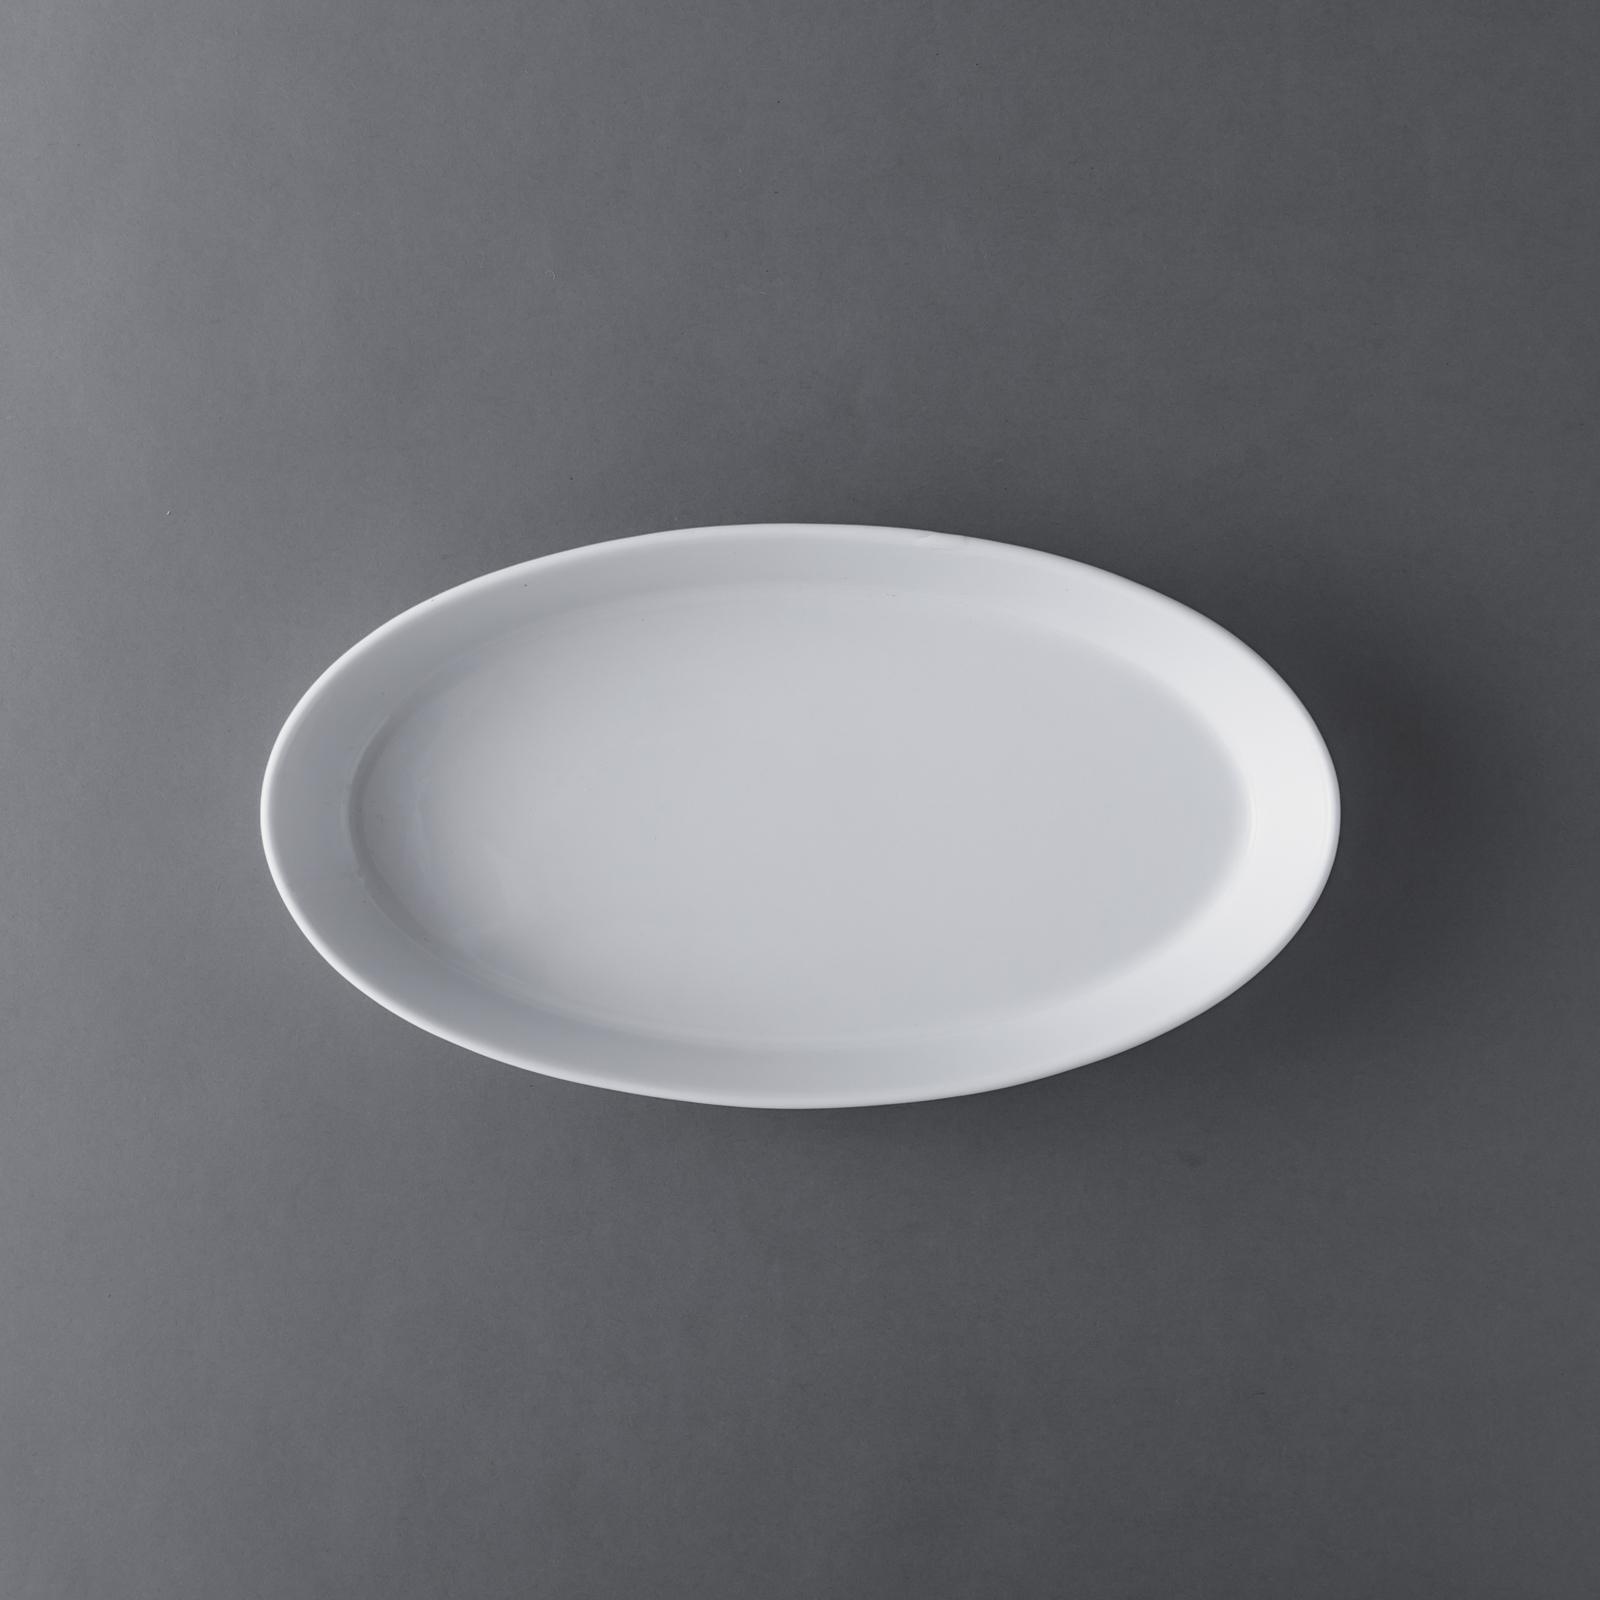 PILLIVUYT _ オーバル ソールディッシュ 31.4×17cm